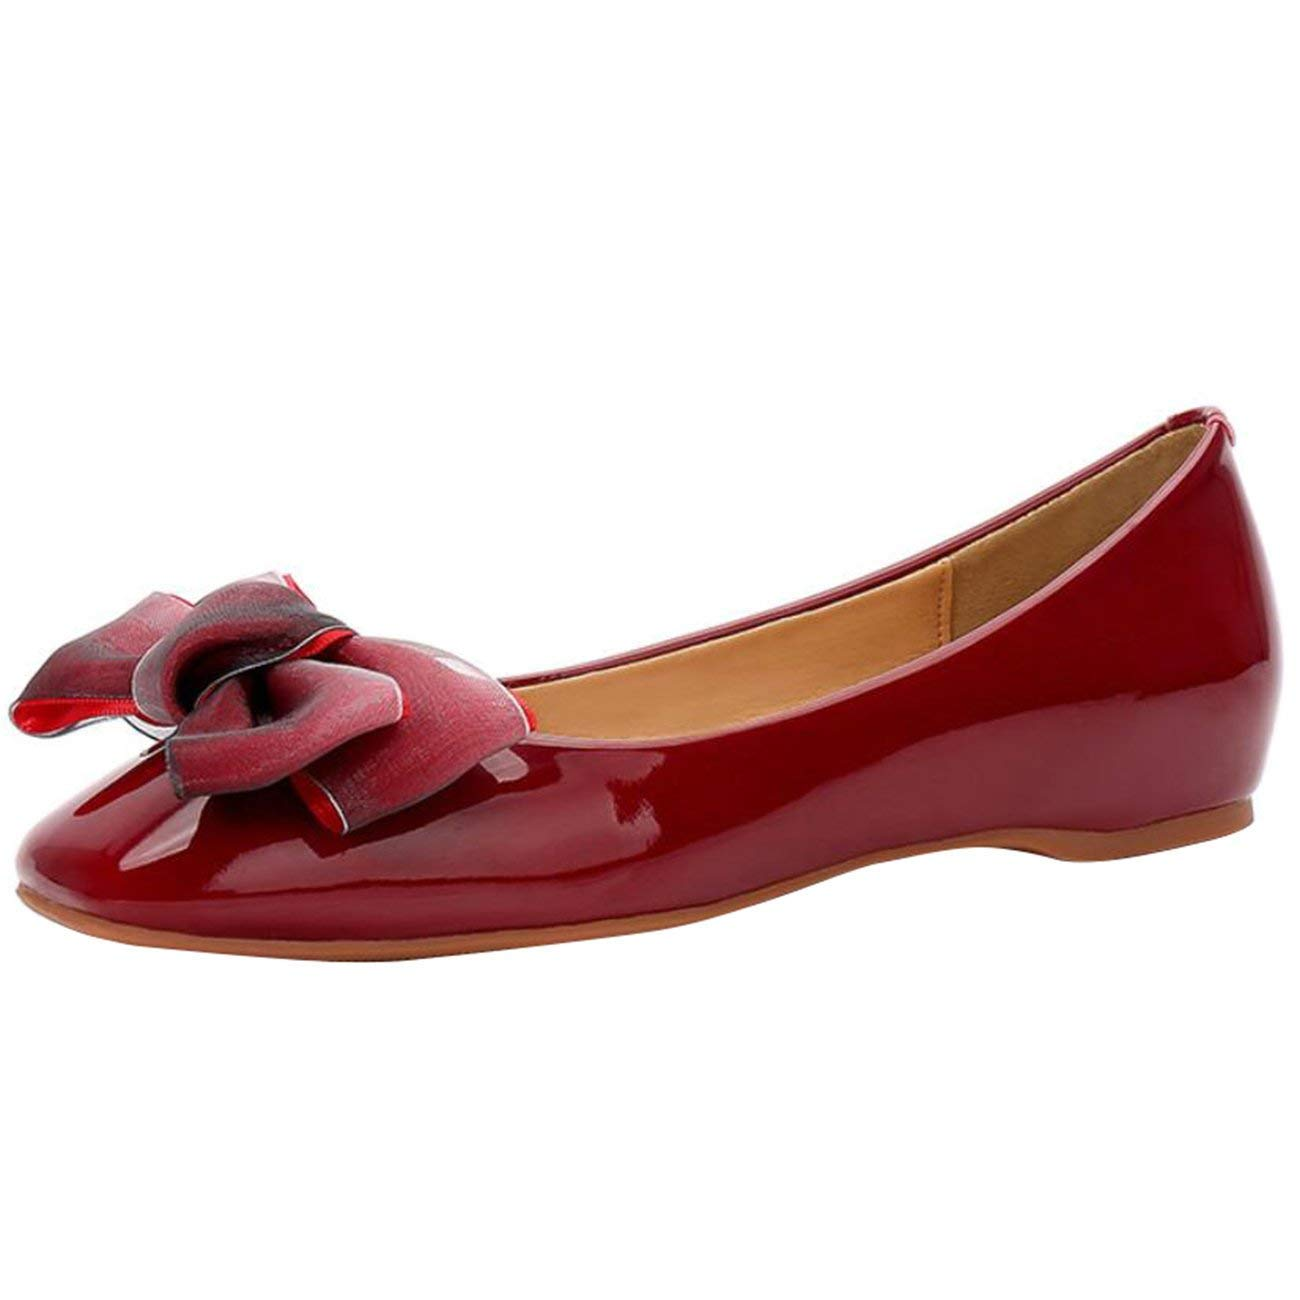 Fuxitoggo Frauen Square-Toe Flache Slip-On Bowknot Ballerinas (Farbe     Burgundy Größe   2 UK) b606c7